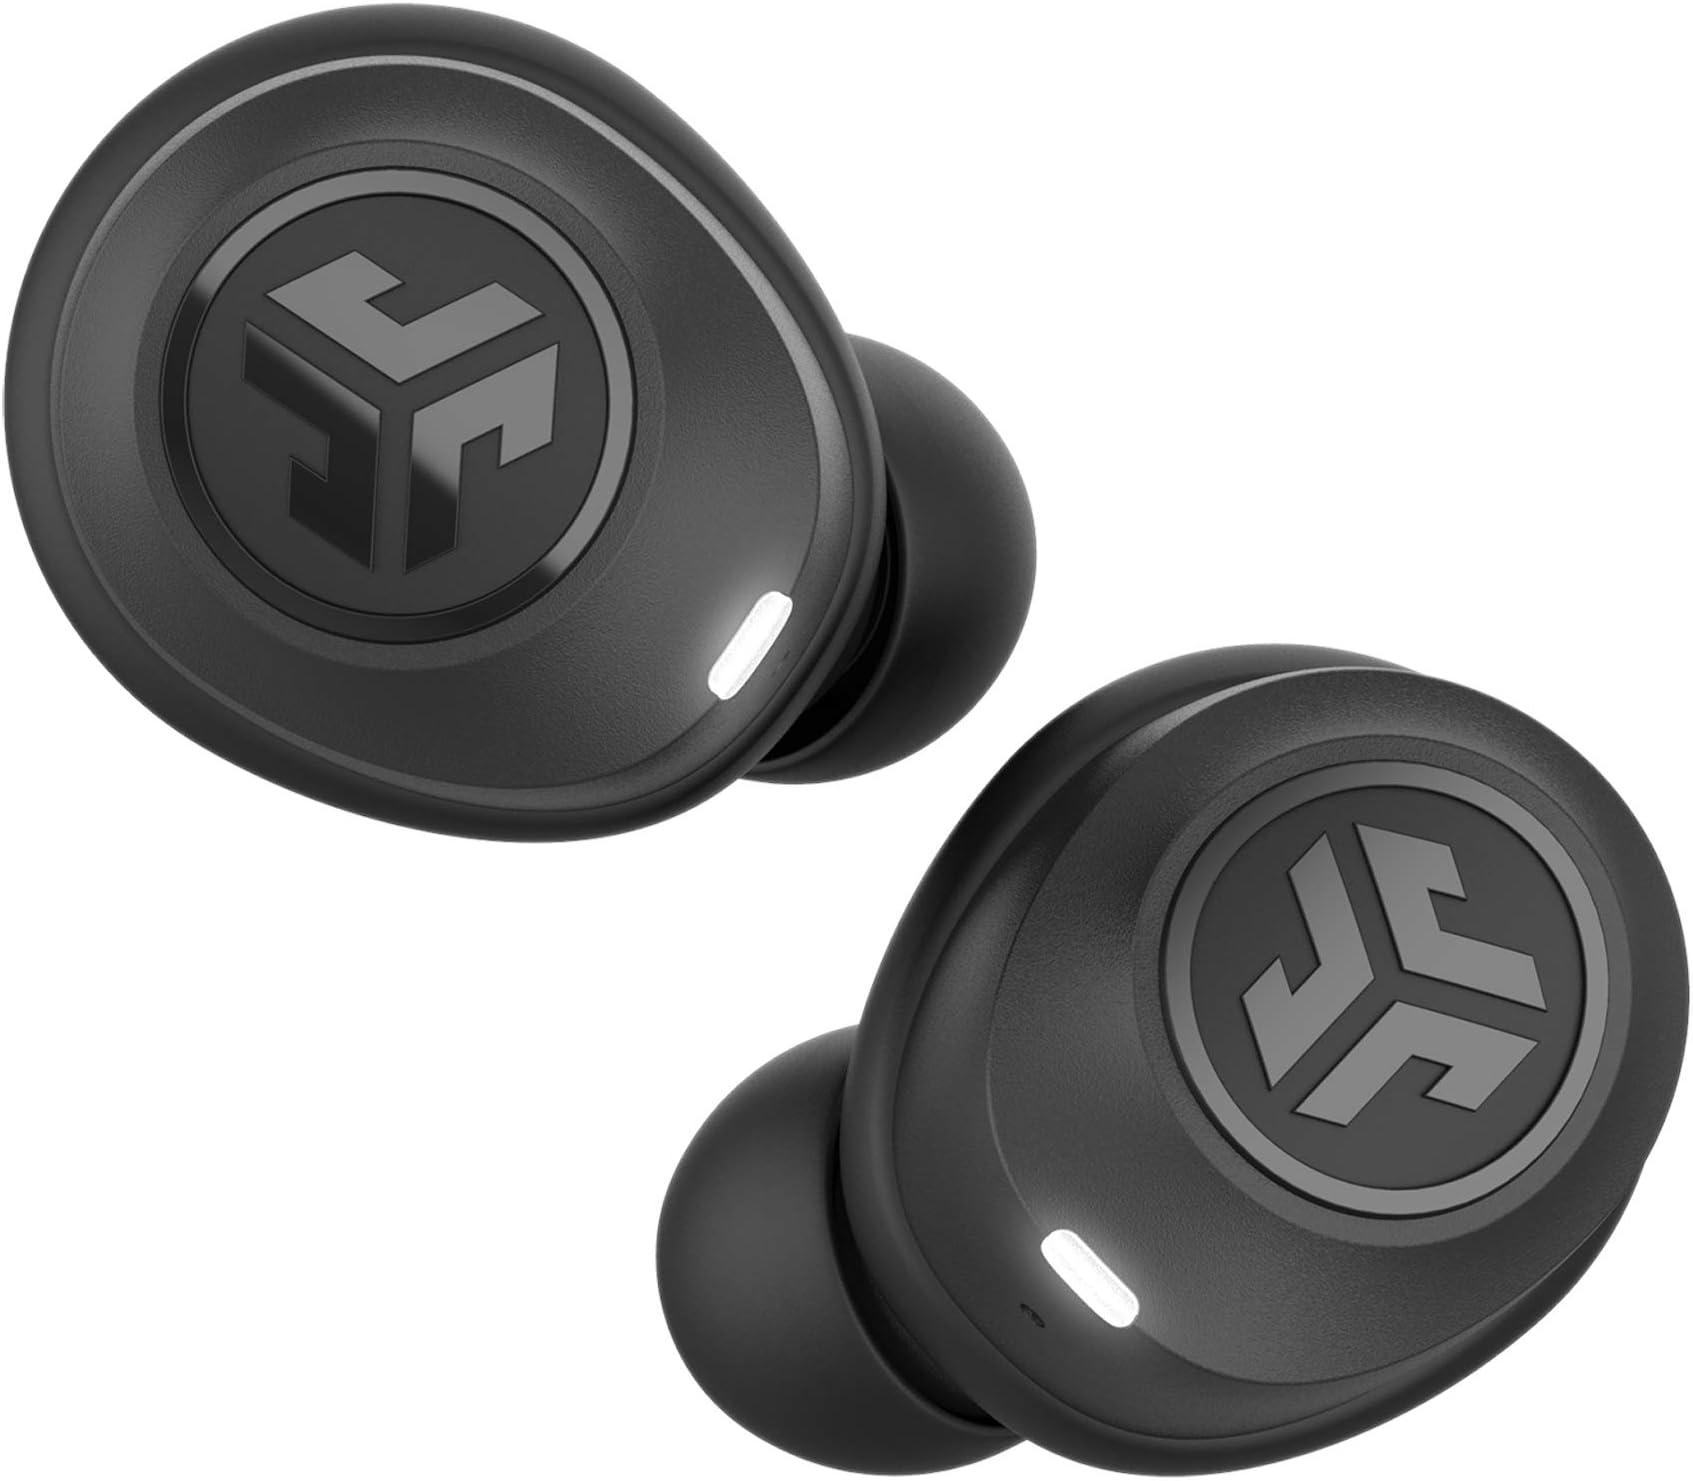 JLab Audio JBuds Air True Wireless Signature Bluetooth Earbuds + Charging Case - Black - IP55 Sweat Resistance - Bluetooth 5.0 Connection - 3 EQ Sound Settings: JLab Signature, Balanced, Bass Boost